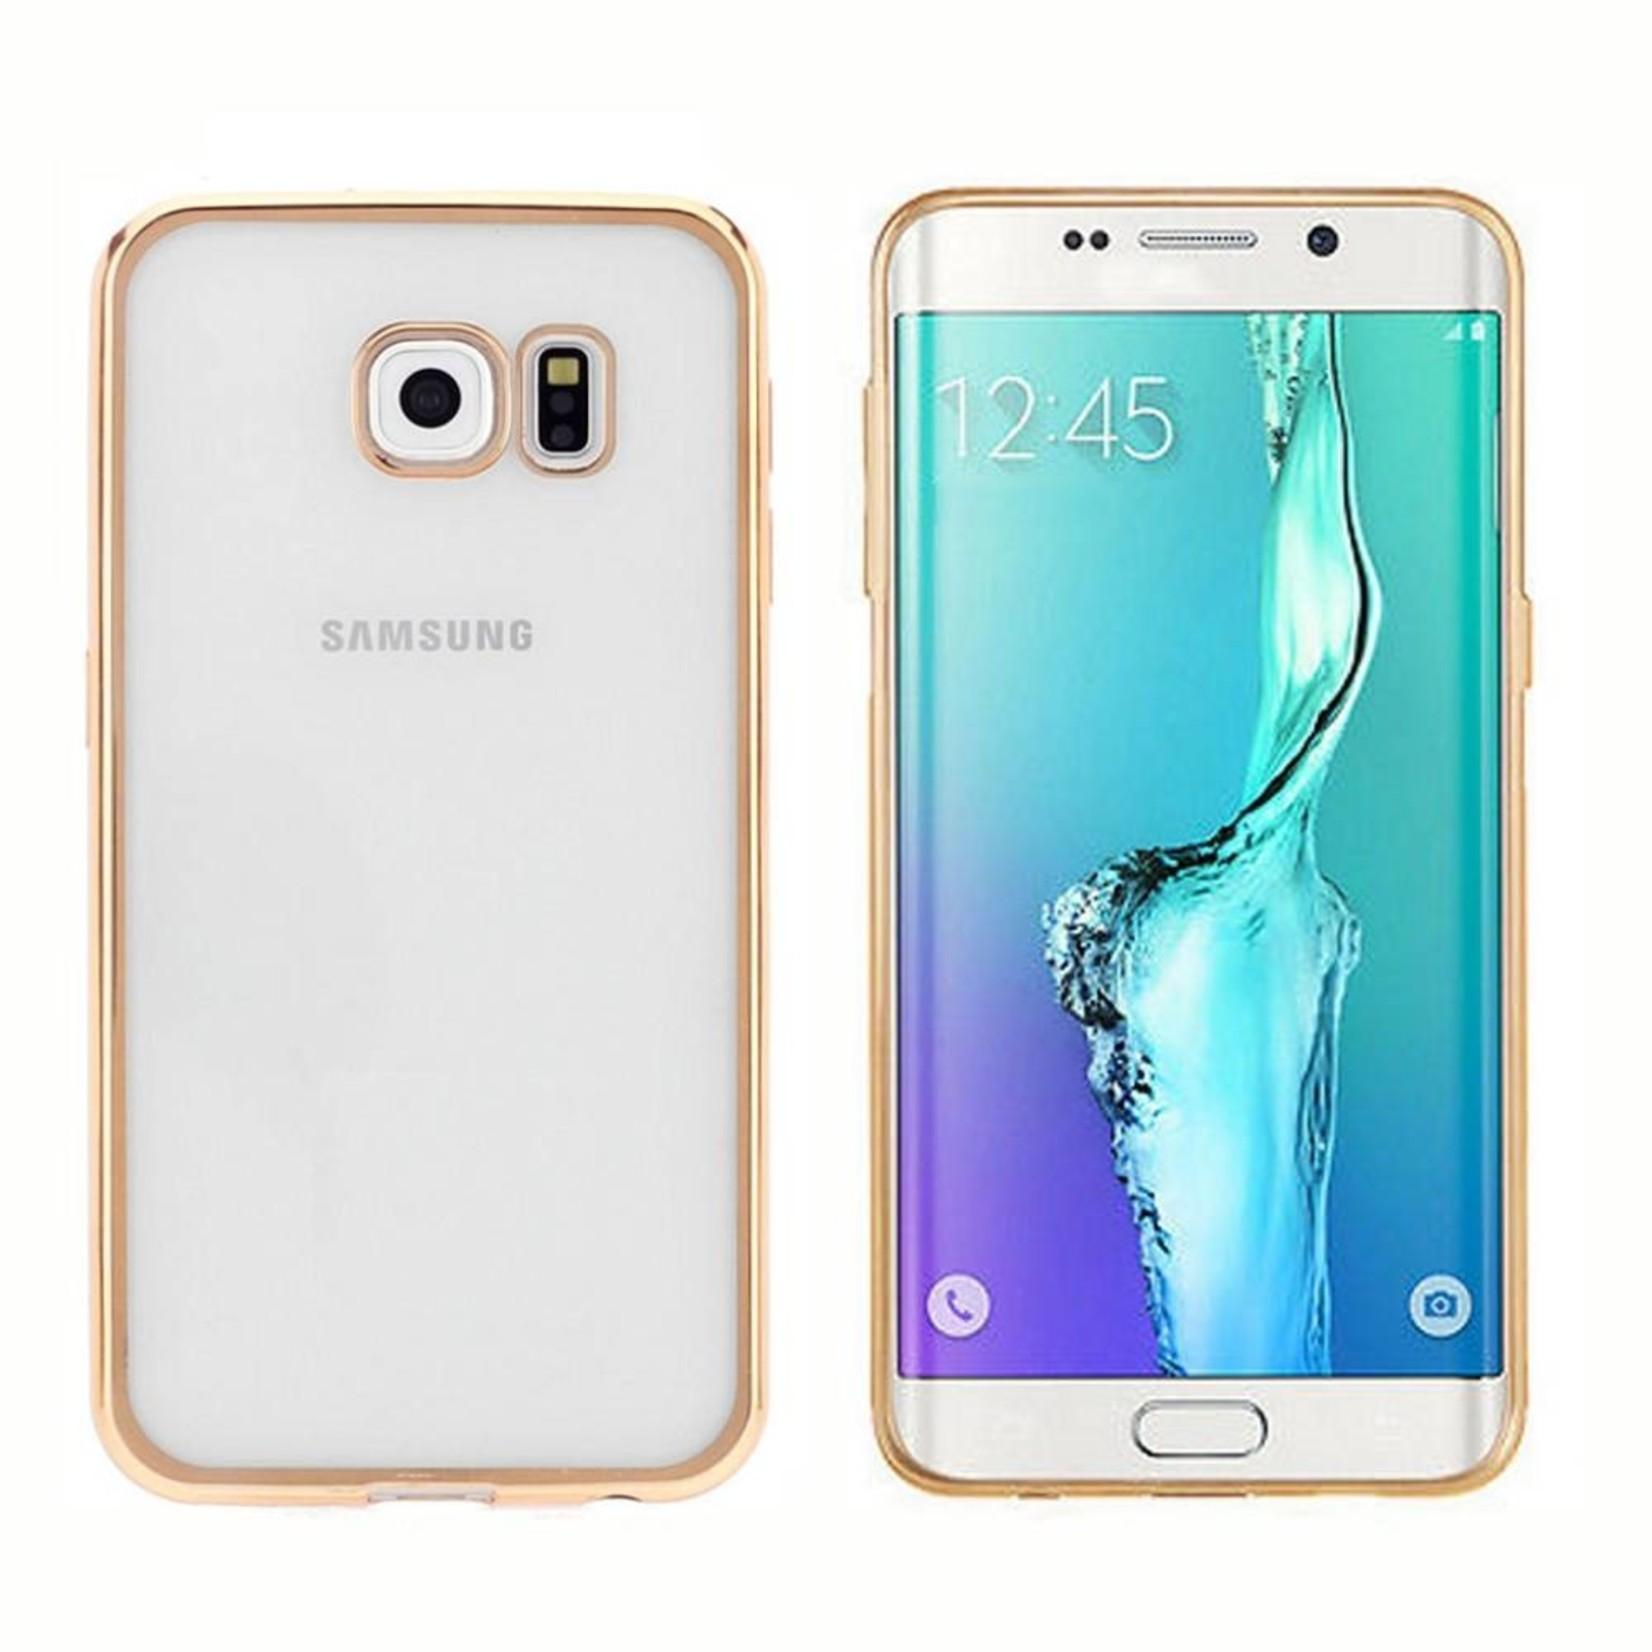 Colorfone Hoesje CoolSkin Bumper Clear Samsung Galaxy S6 Edge Plus Goud